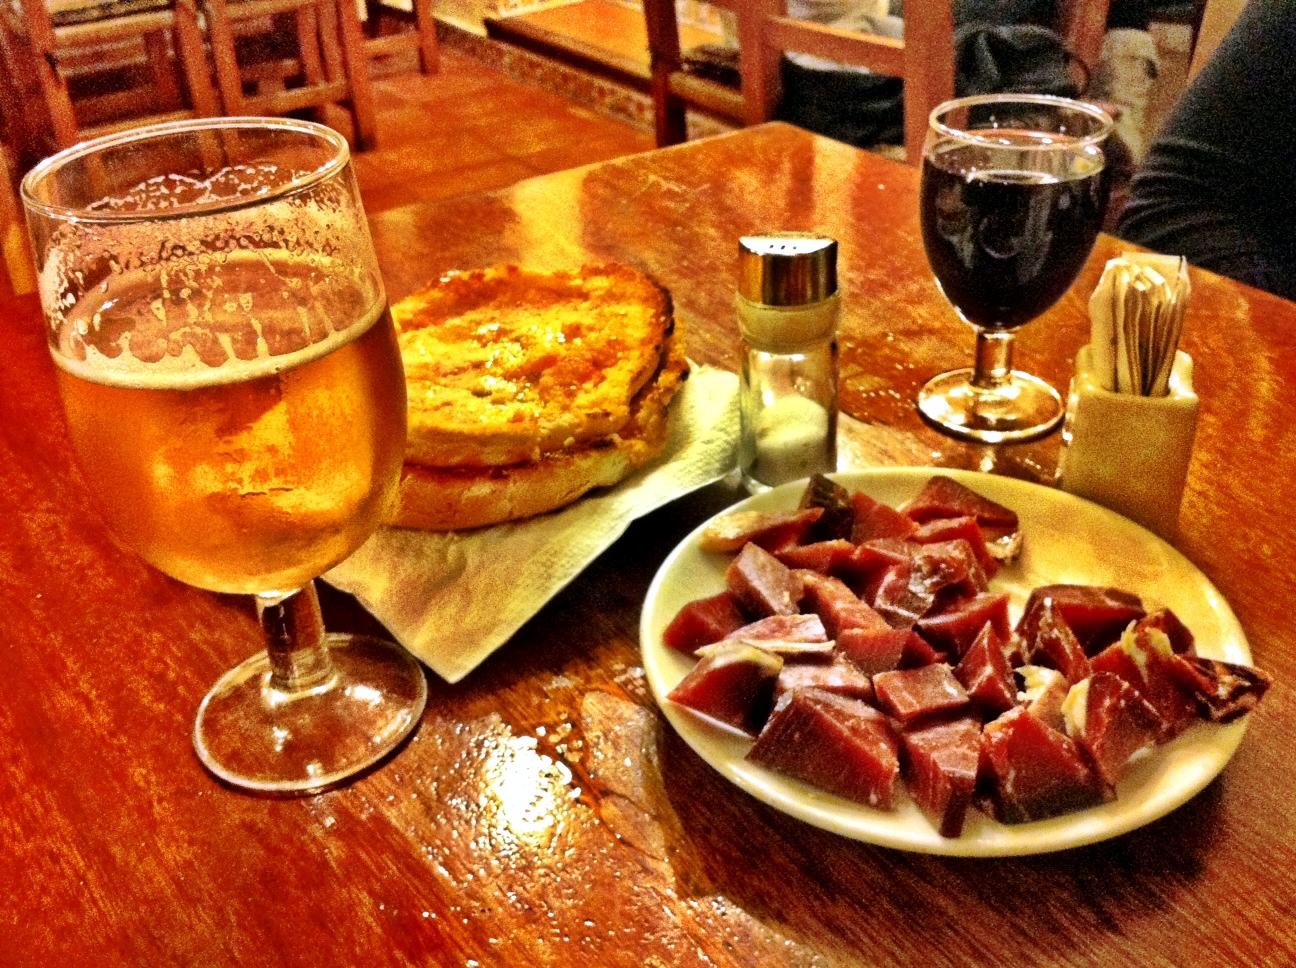 Plato de jamón, vino y cerveza Фото: Wikipedia C.C.